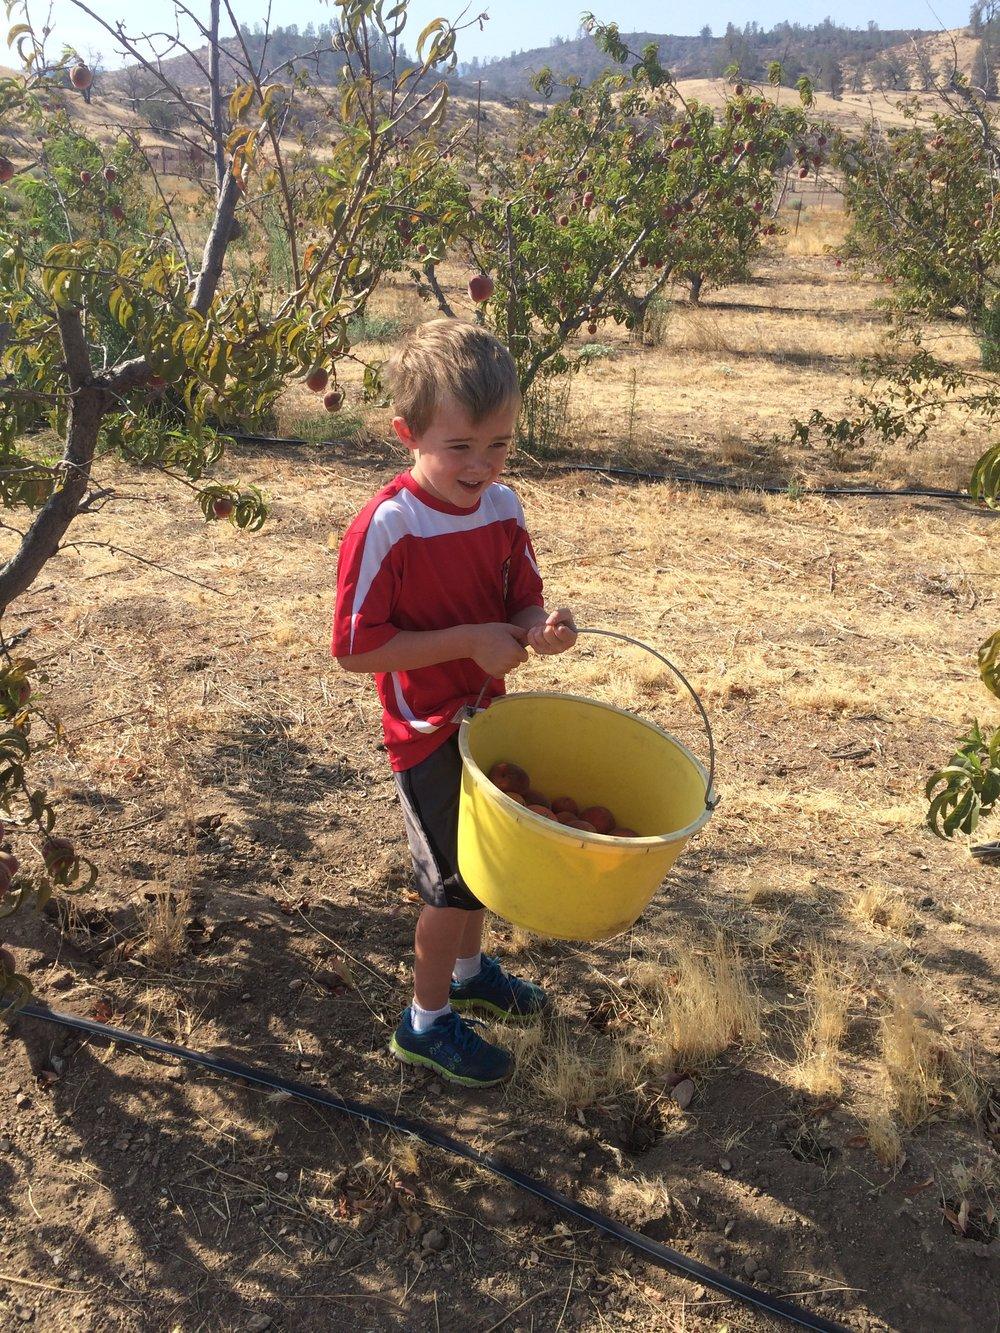 I had a helper pick peaches with me.